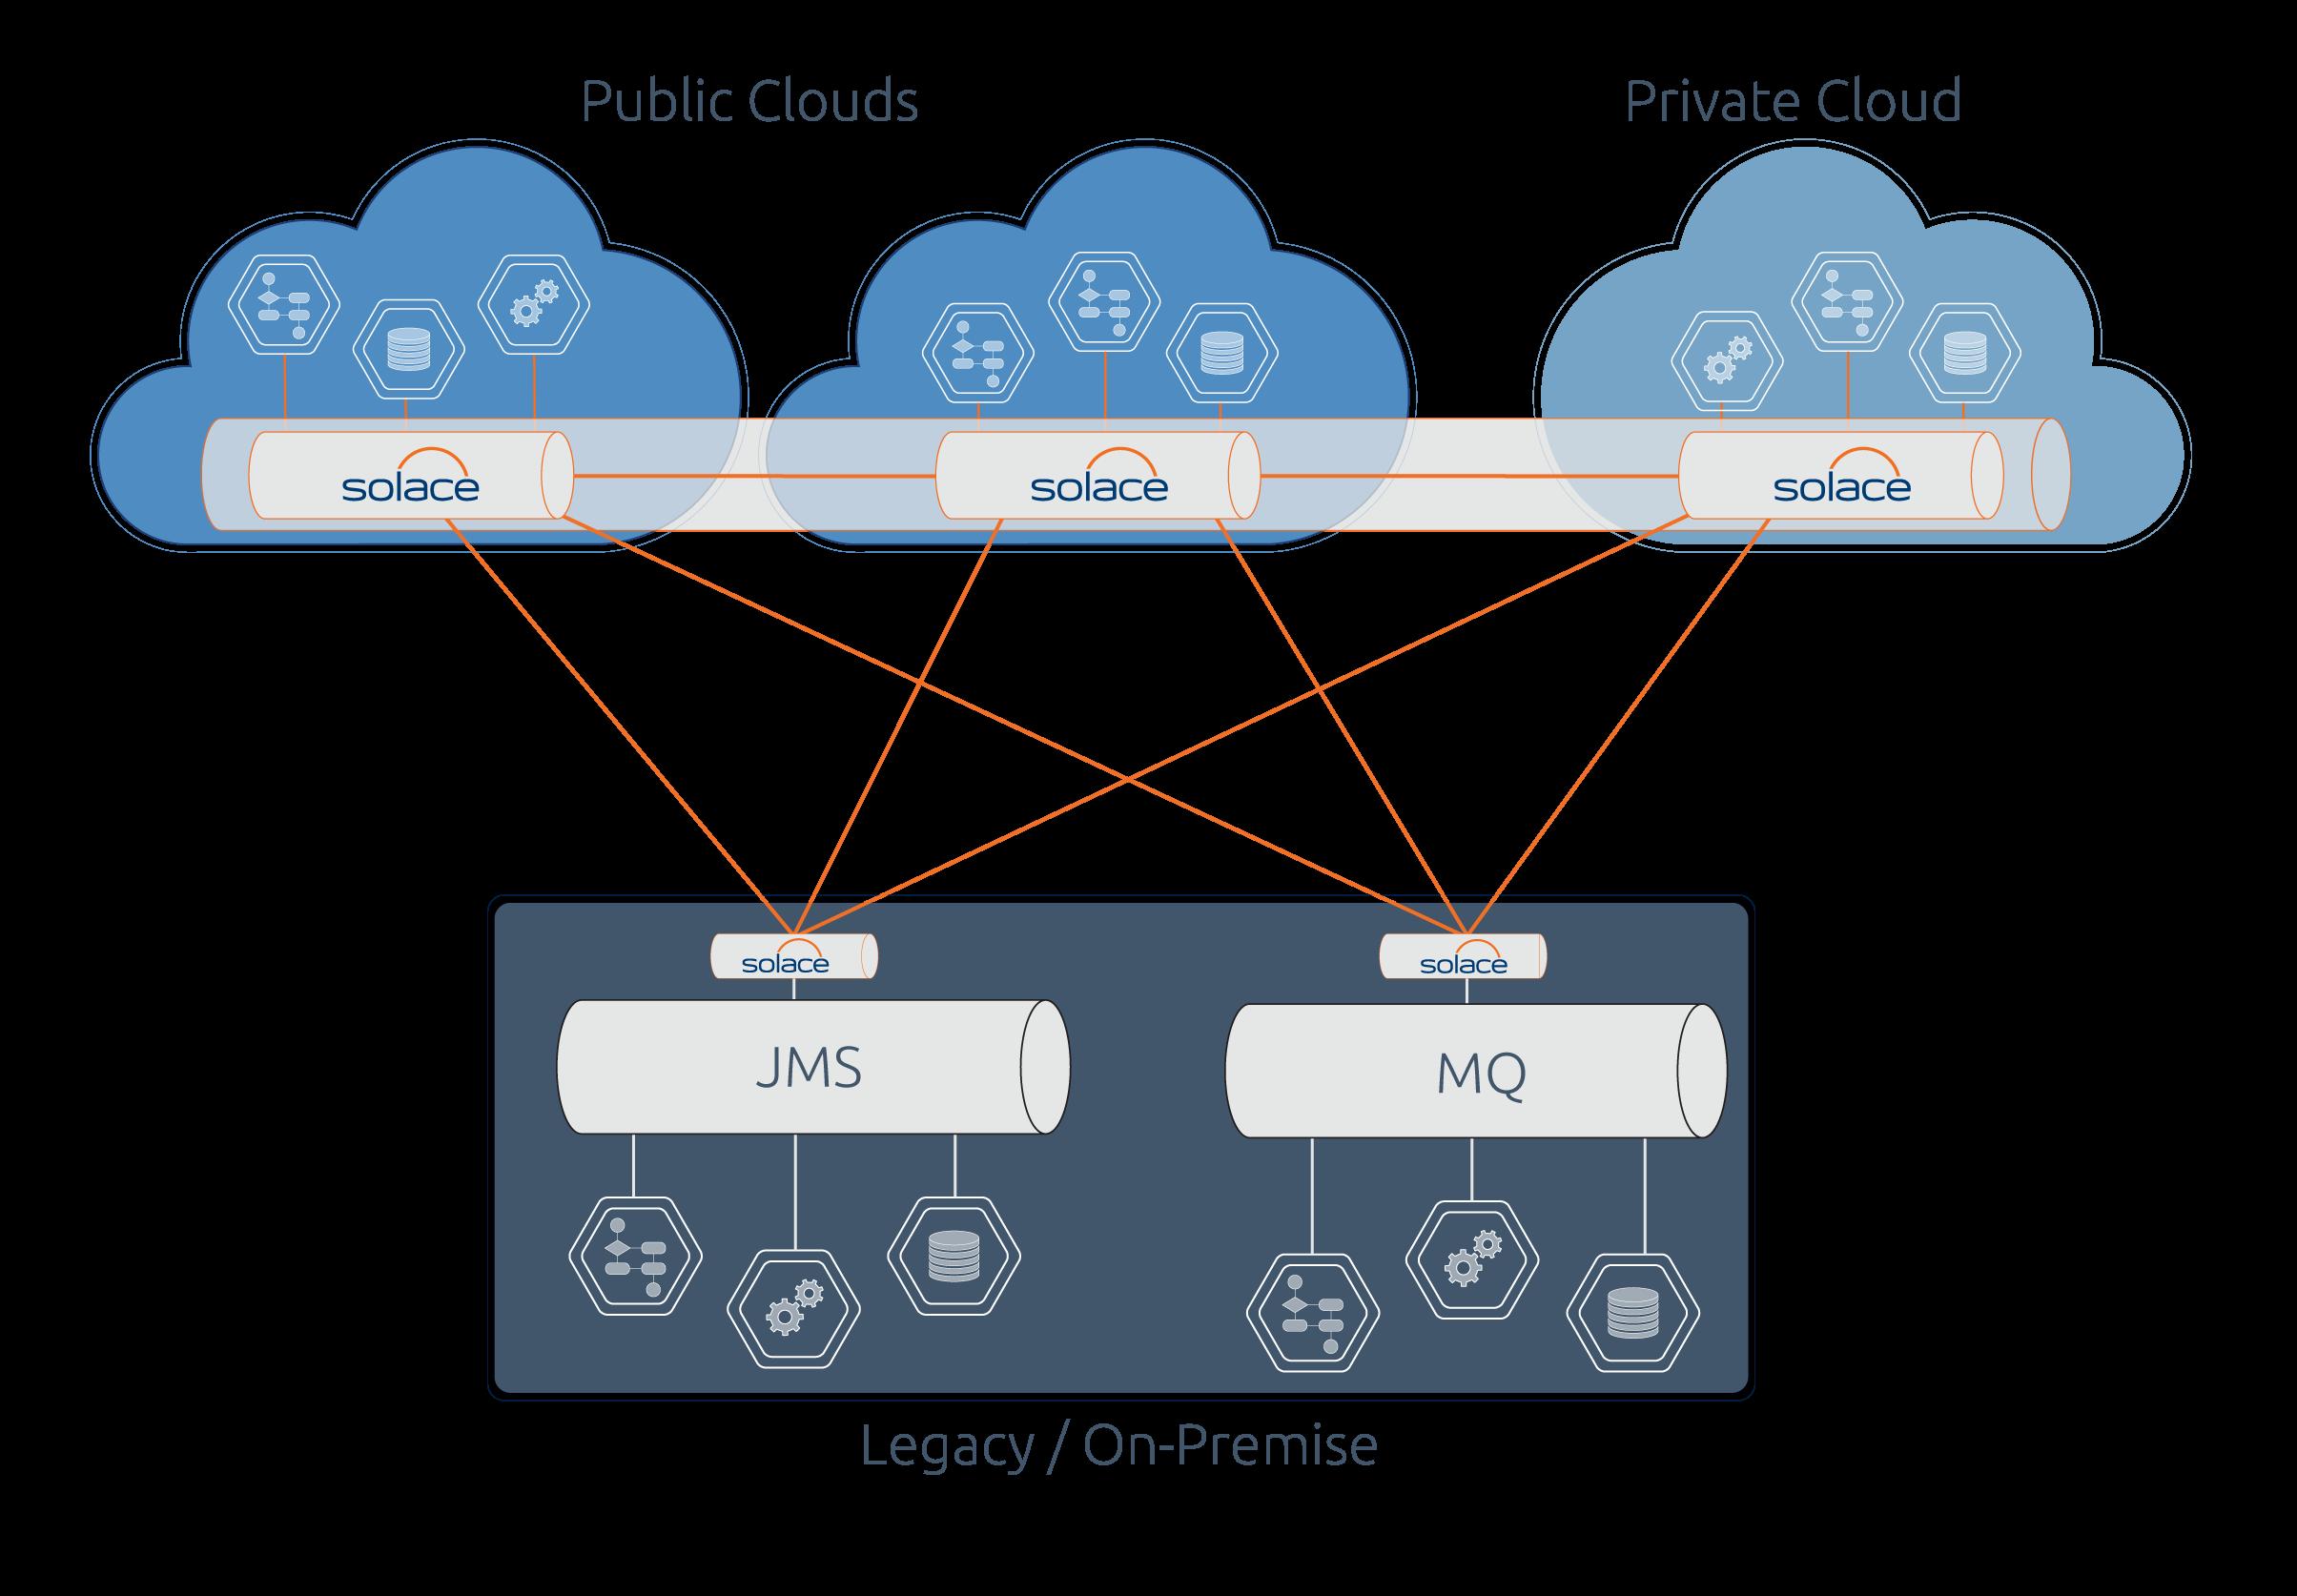 nash-frtb-post-hybrid-cloud-diagram